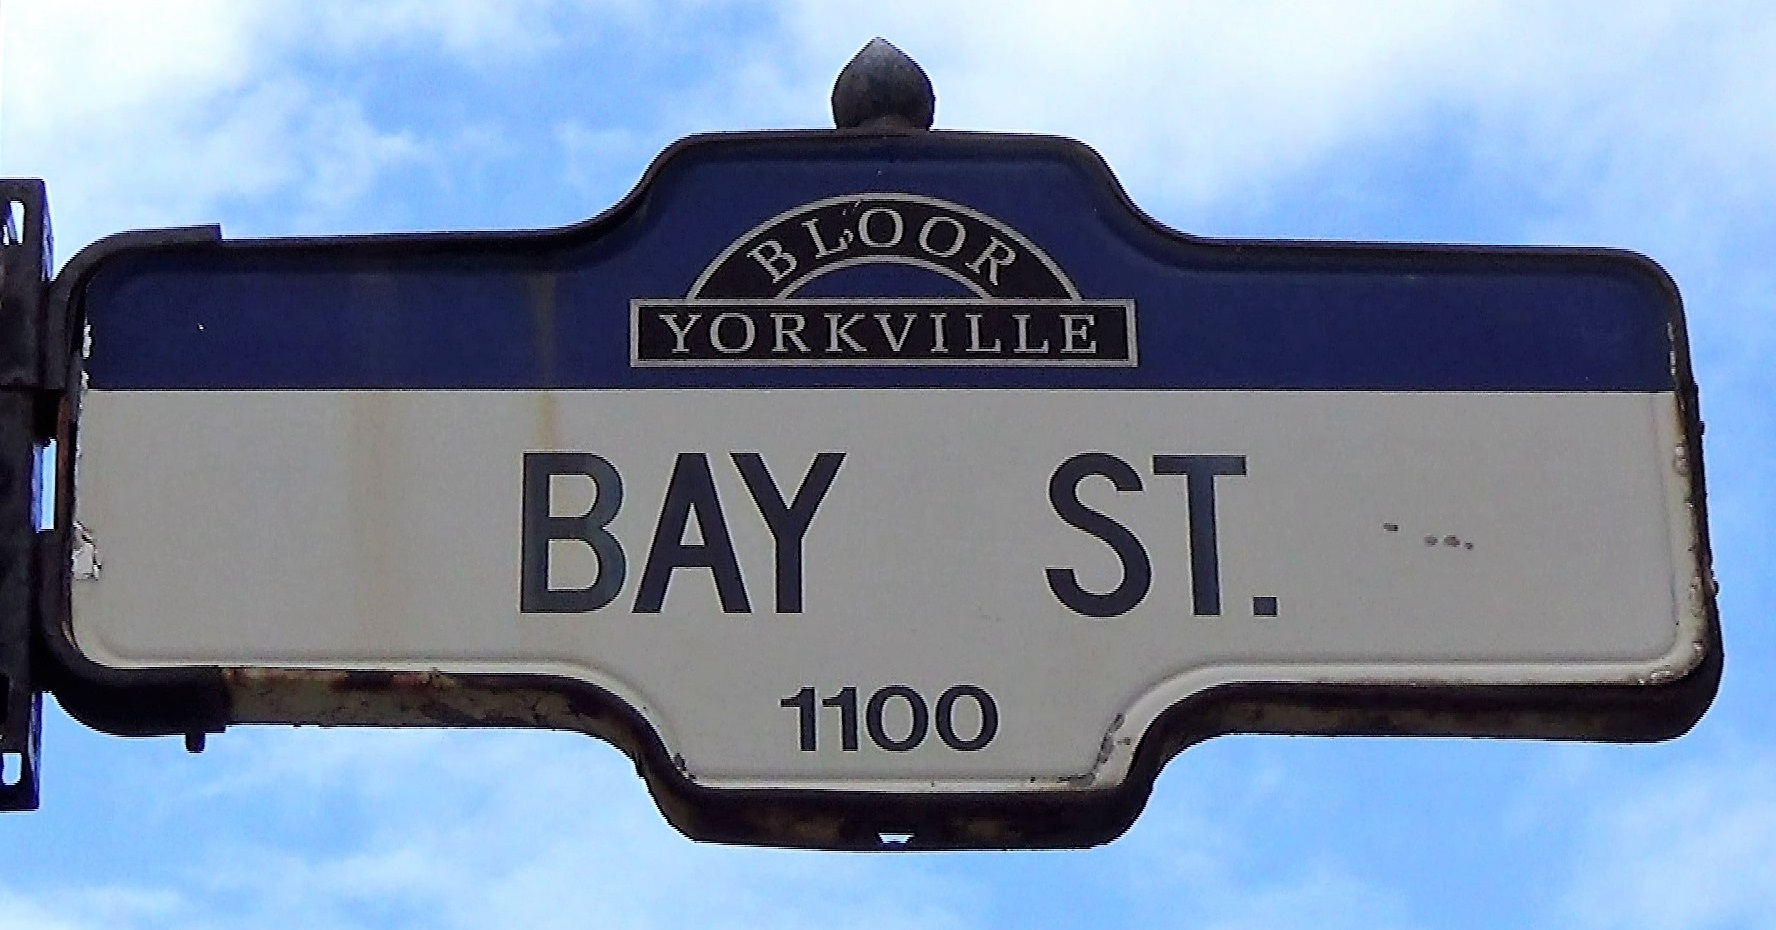 Bay Street - Wikipedia